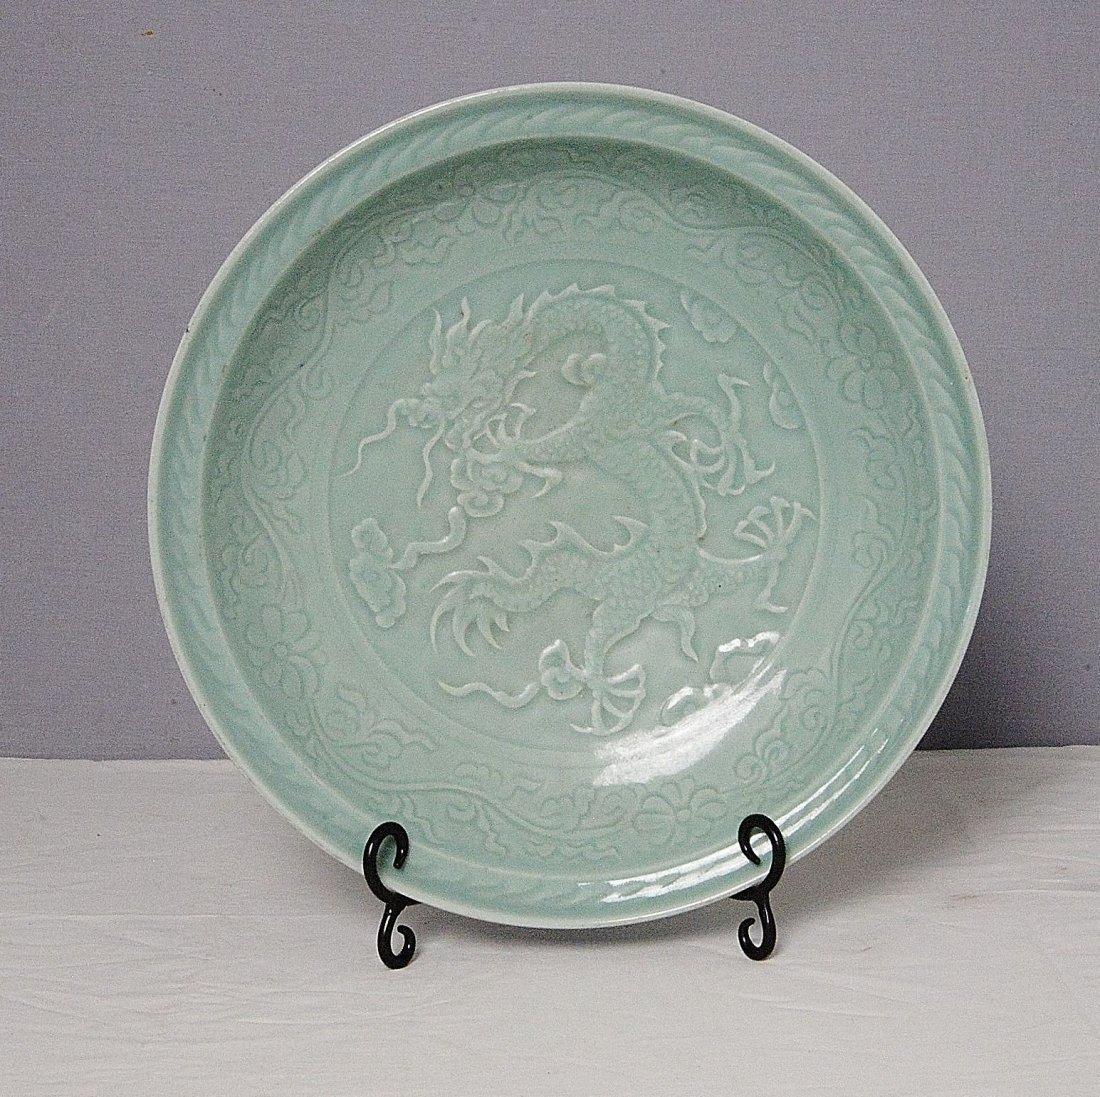 Chinese Monochrome Green Glaze Porcelain Plate